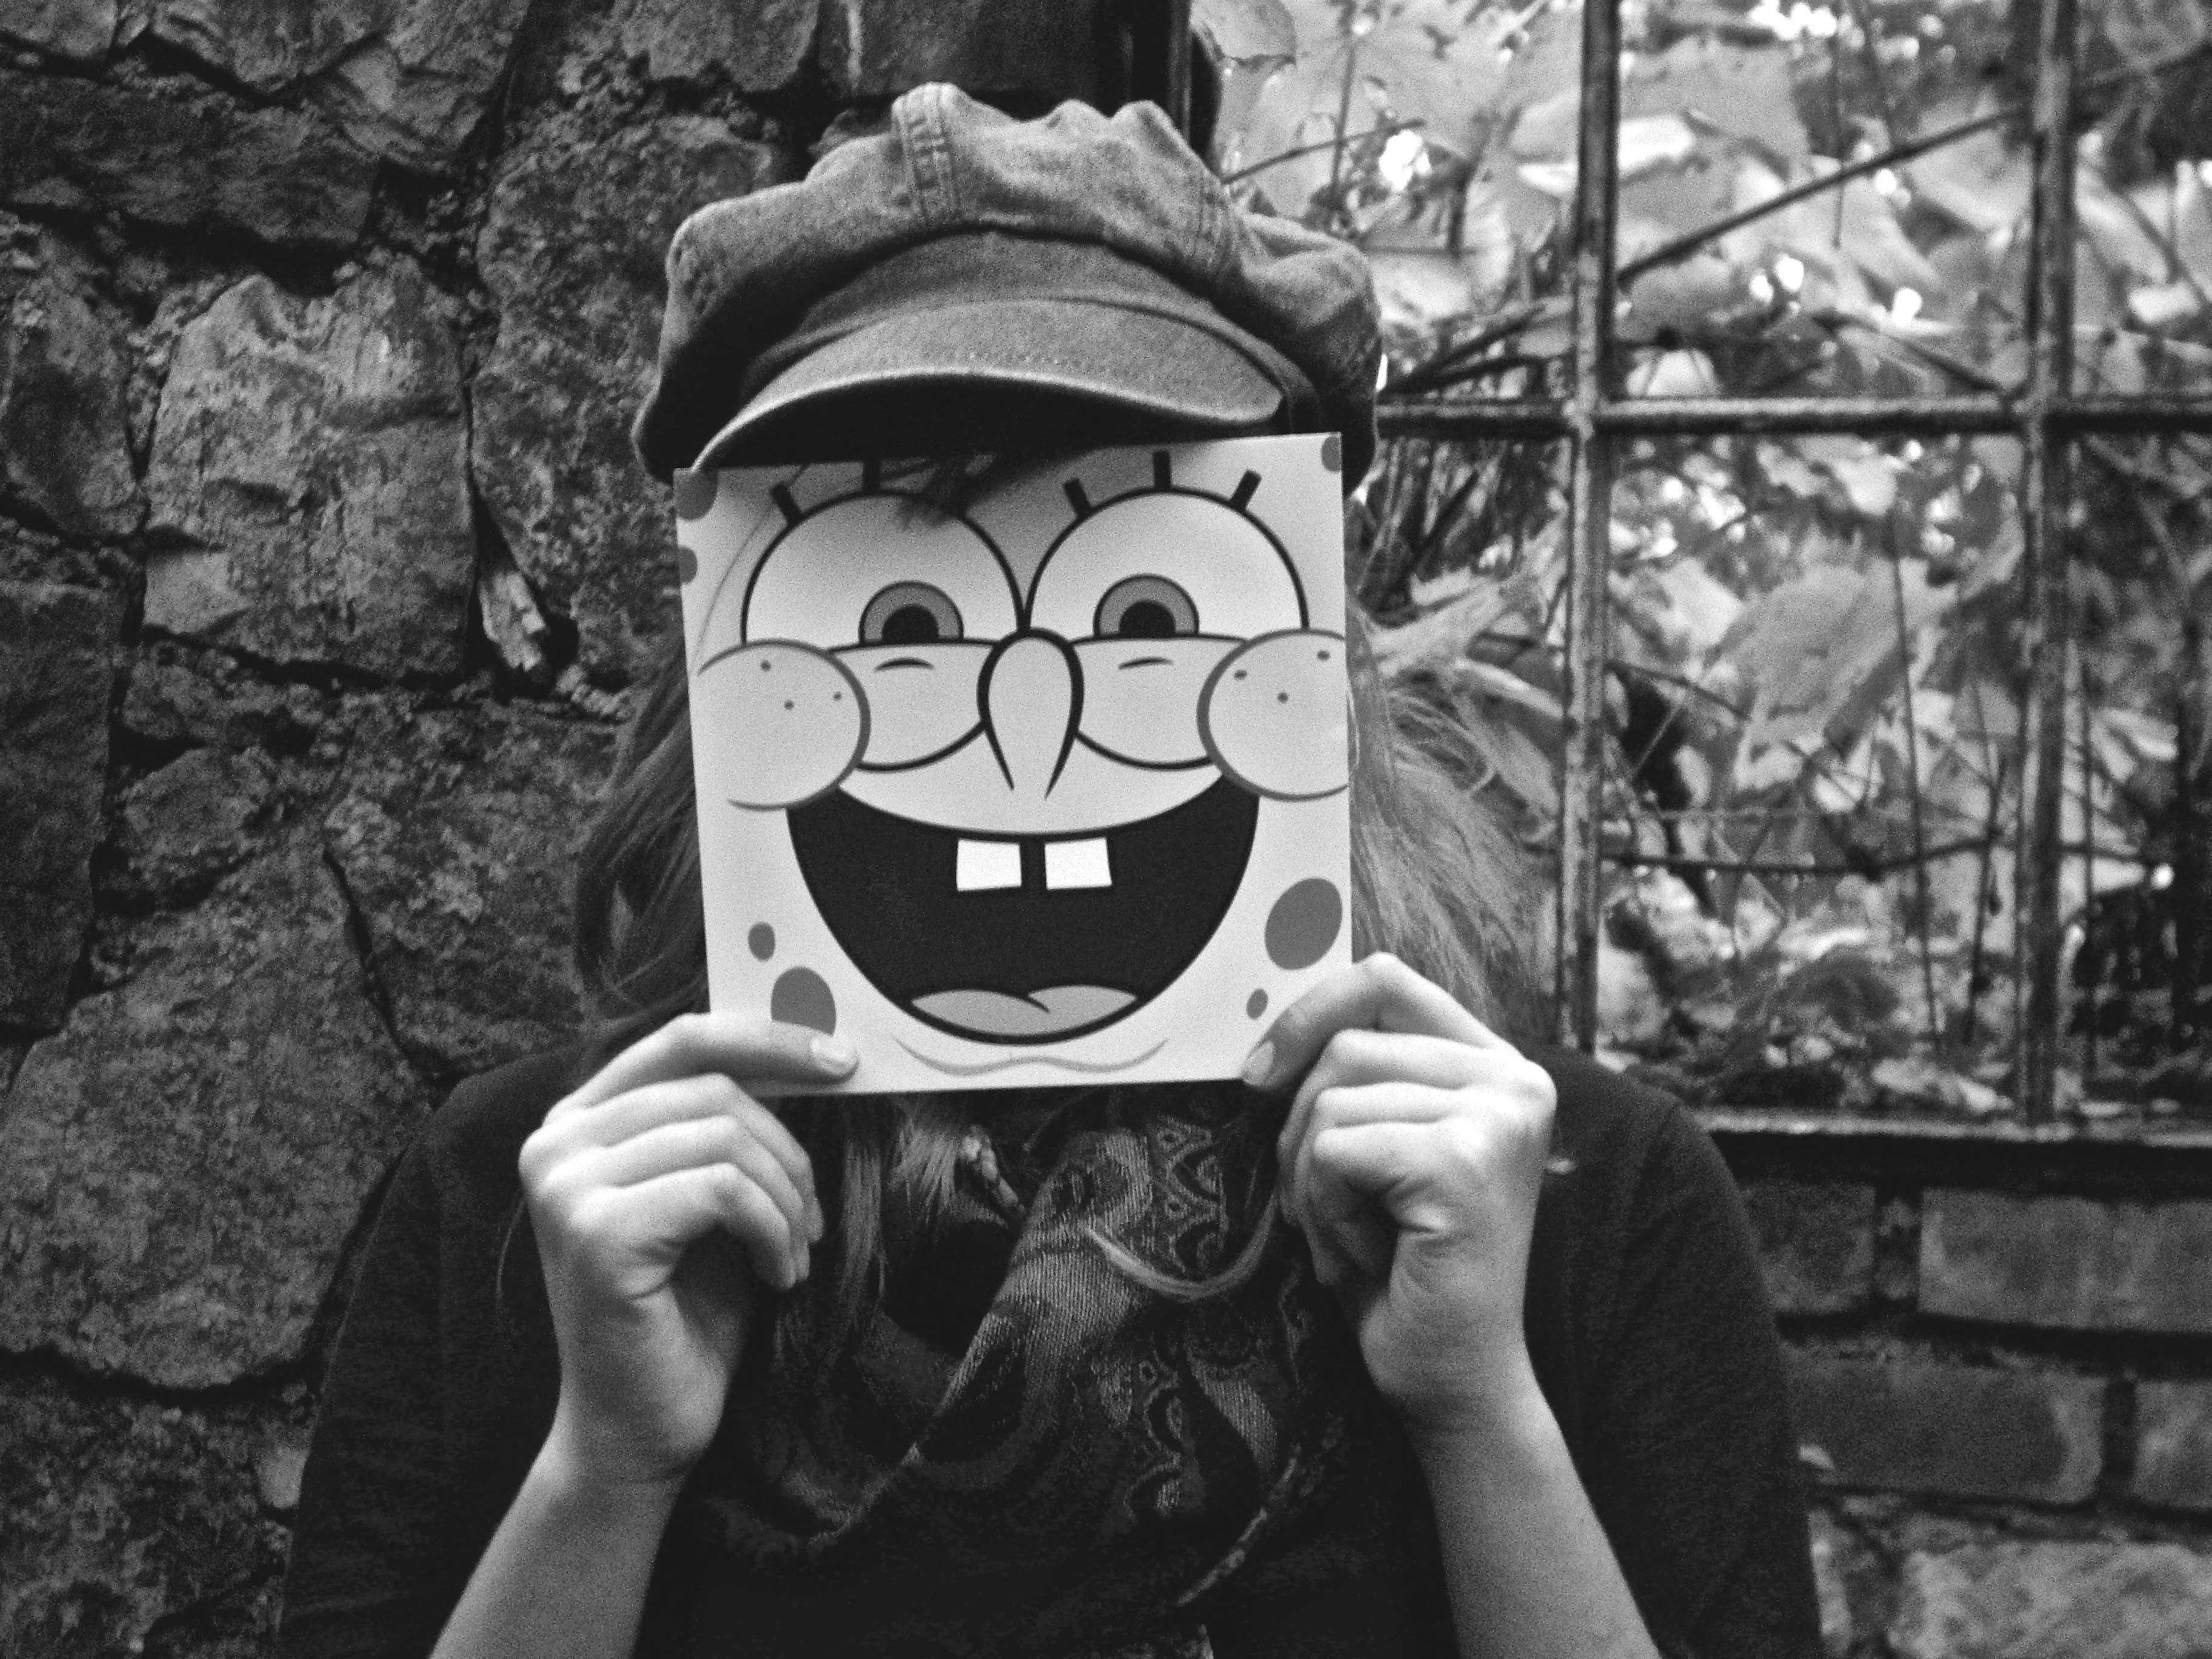 Community grieves untimely death of SpongeBob creator